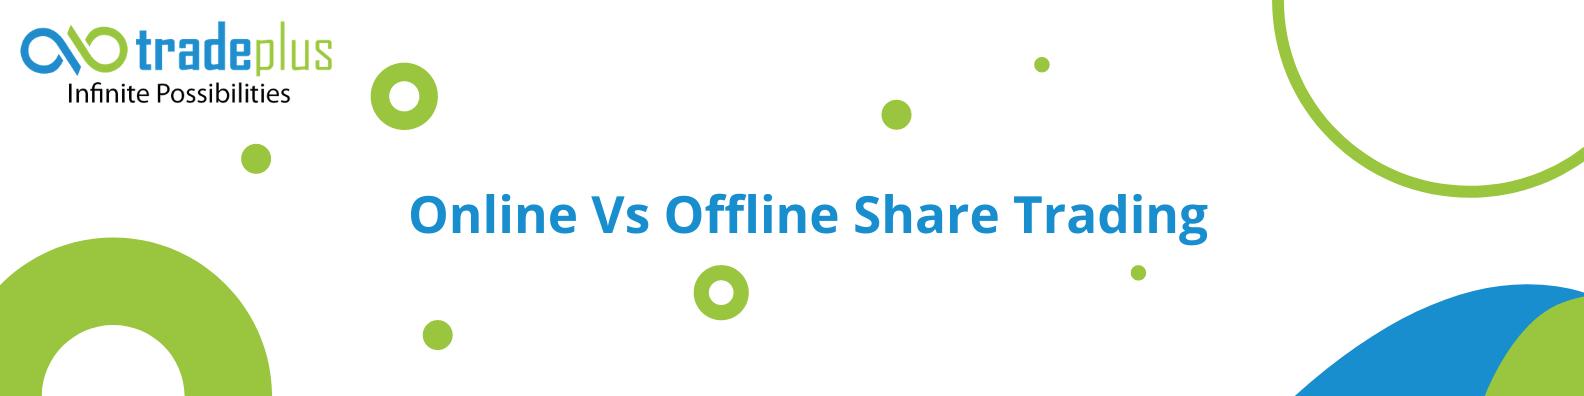 Blue and Yellow Technology LinkedIn Banner 5 Online Vs Offline Share Trading